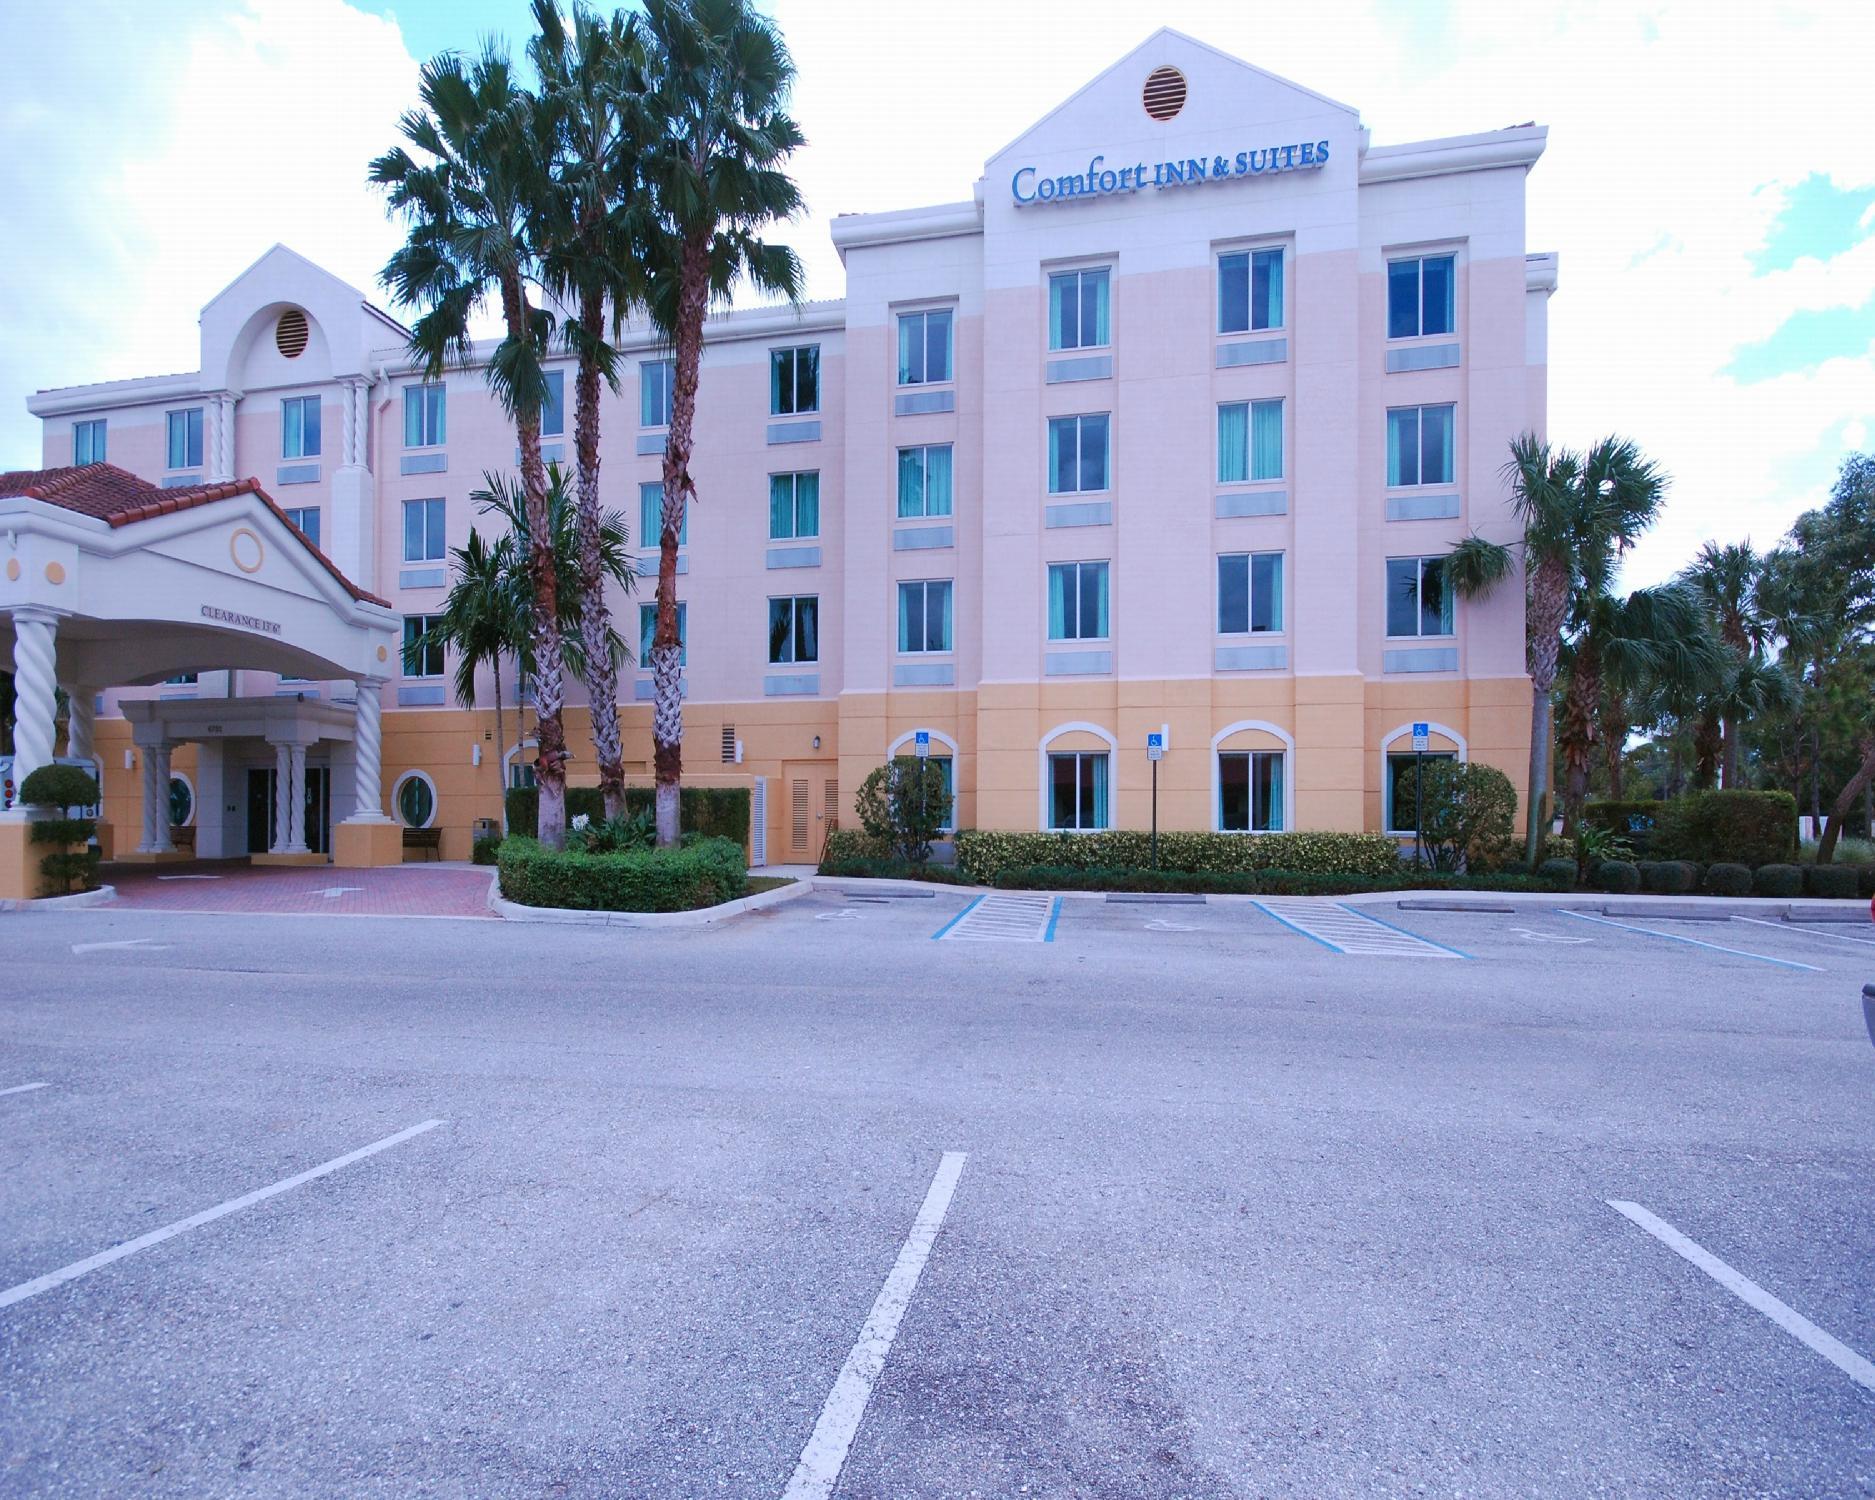 Comfort Inn & Suites Jupiter